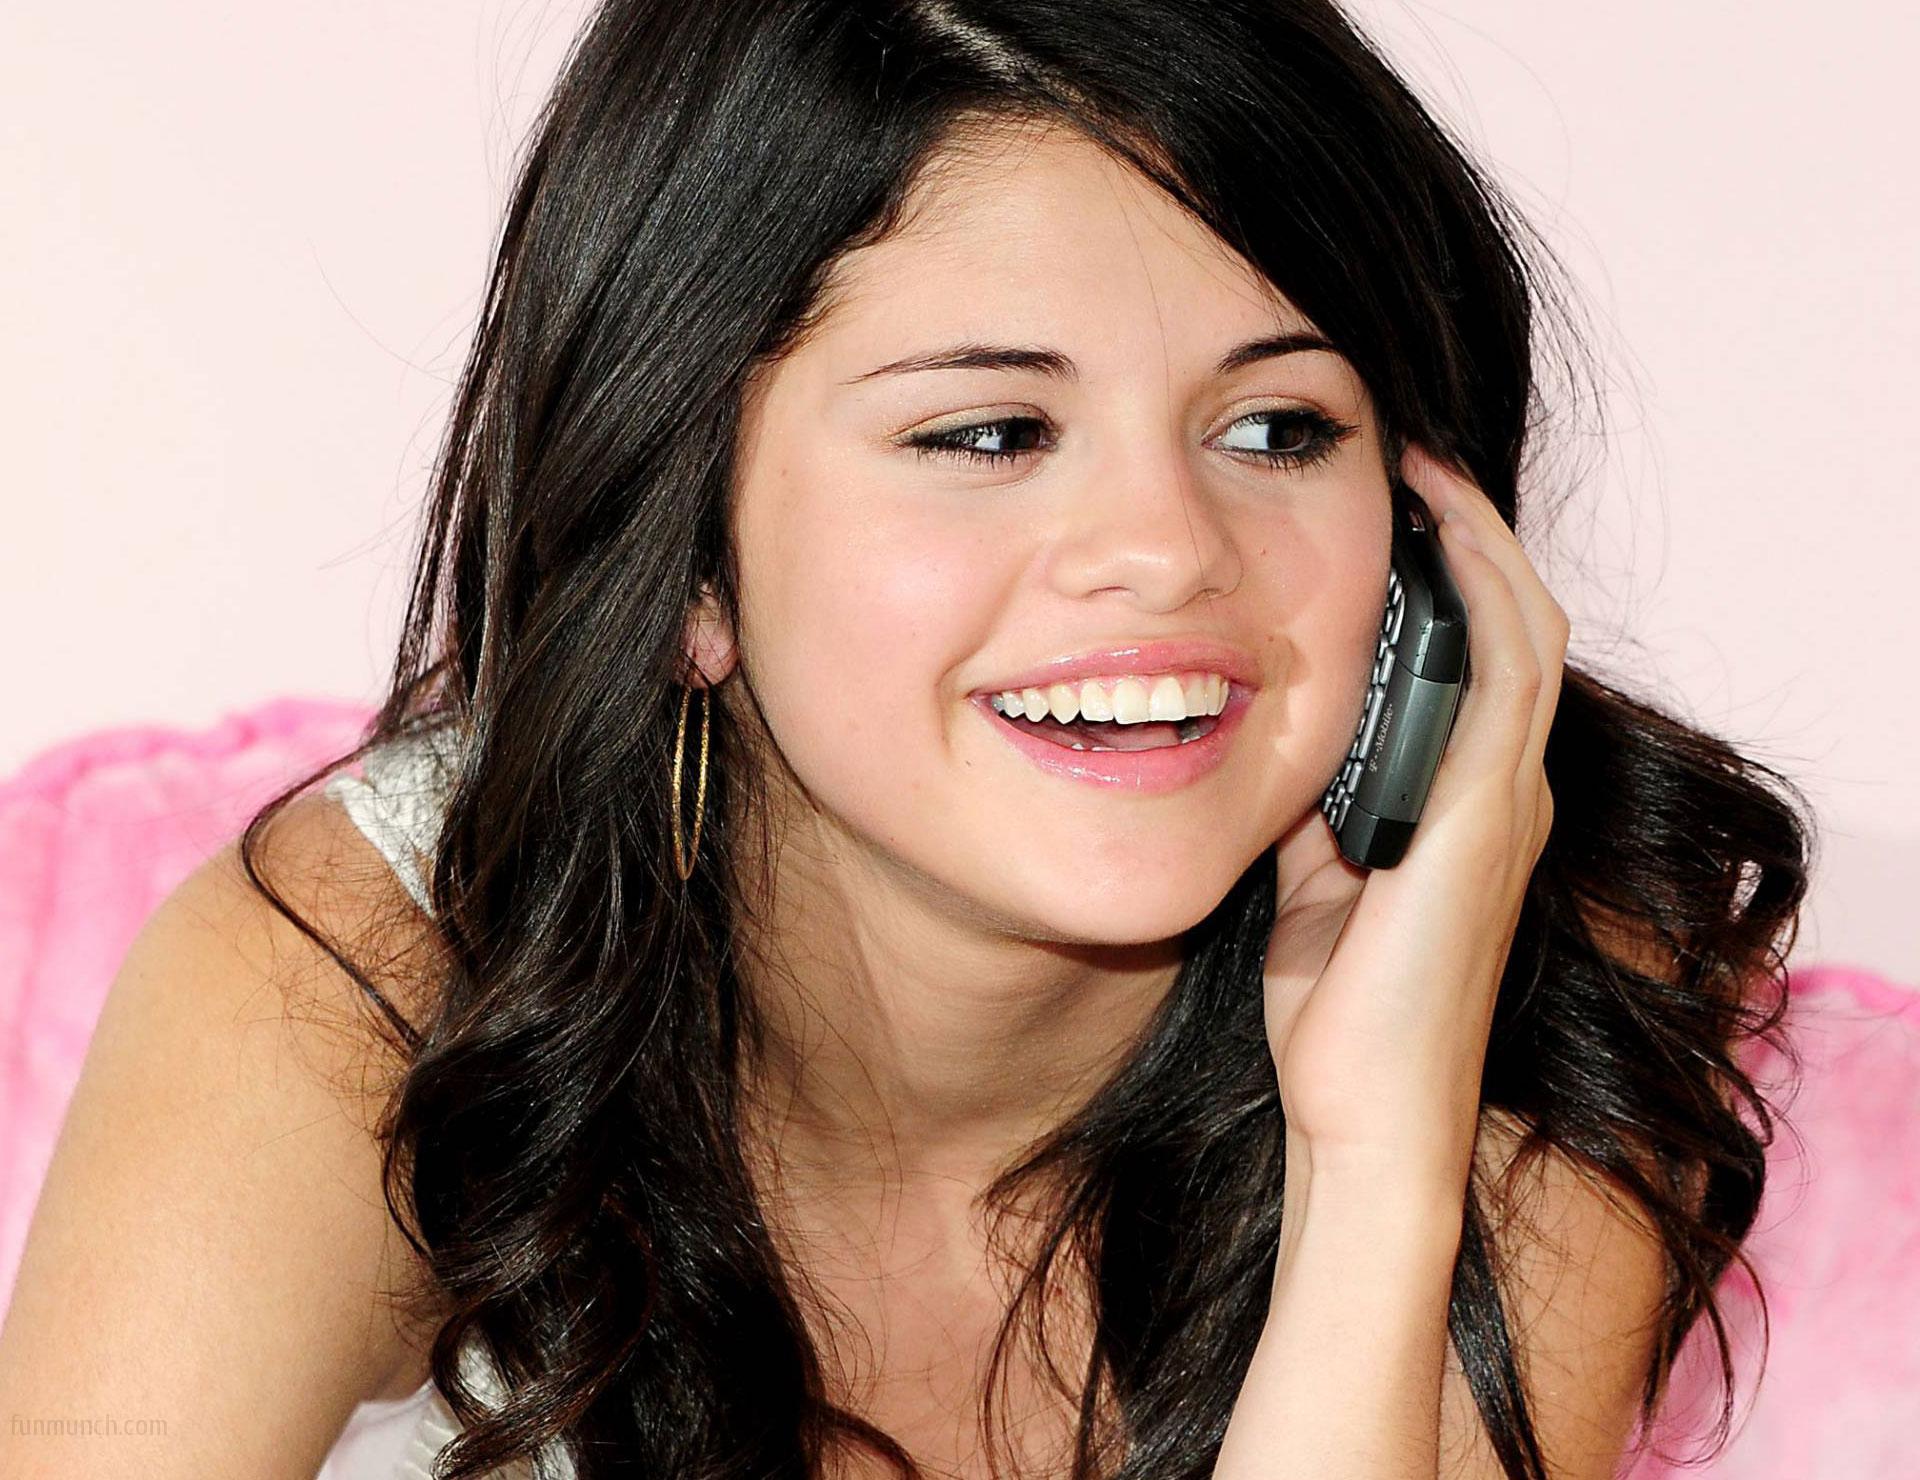 Selena-Gomez-HD